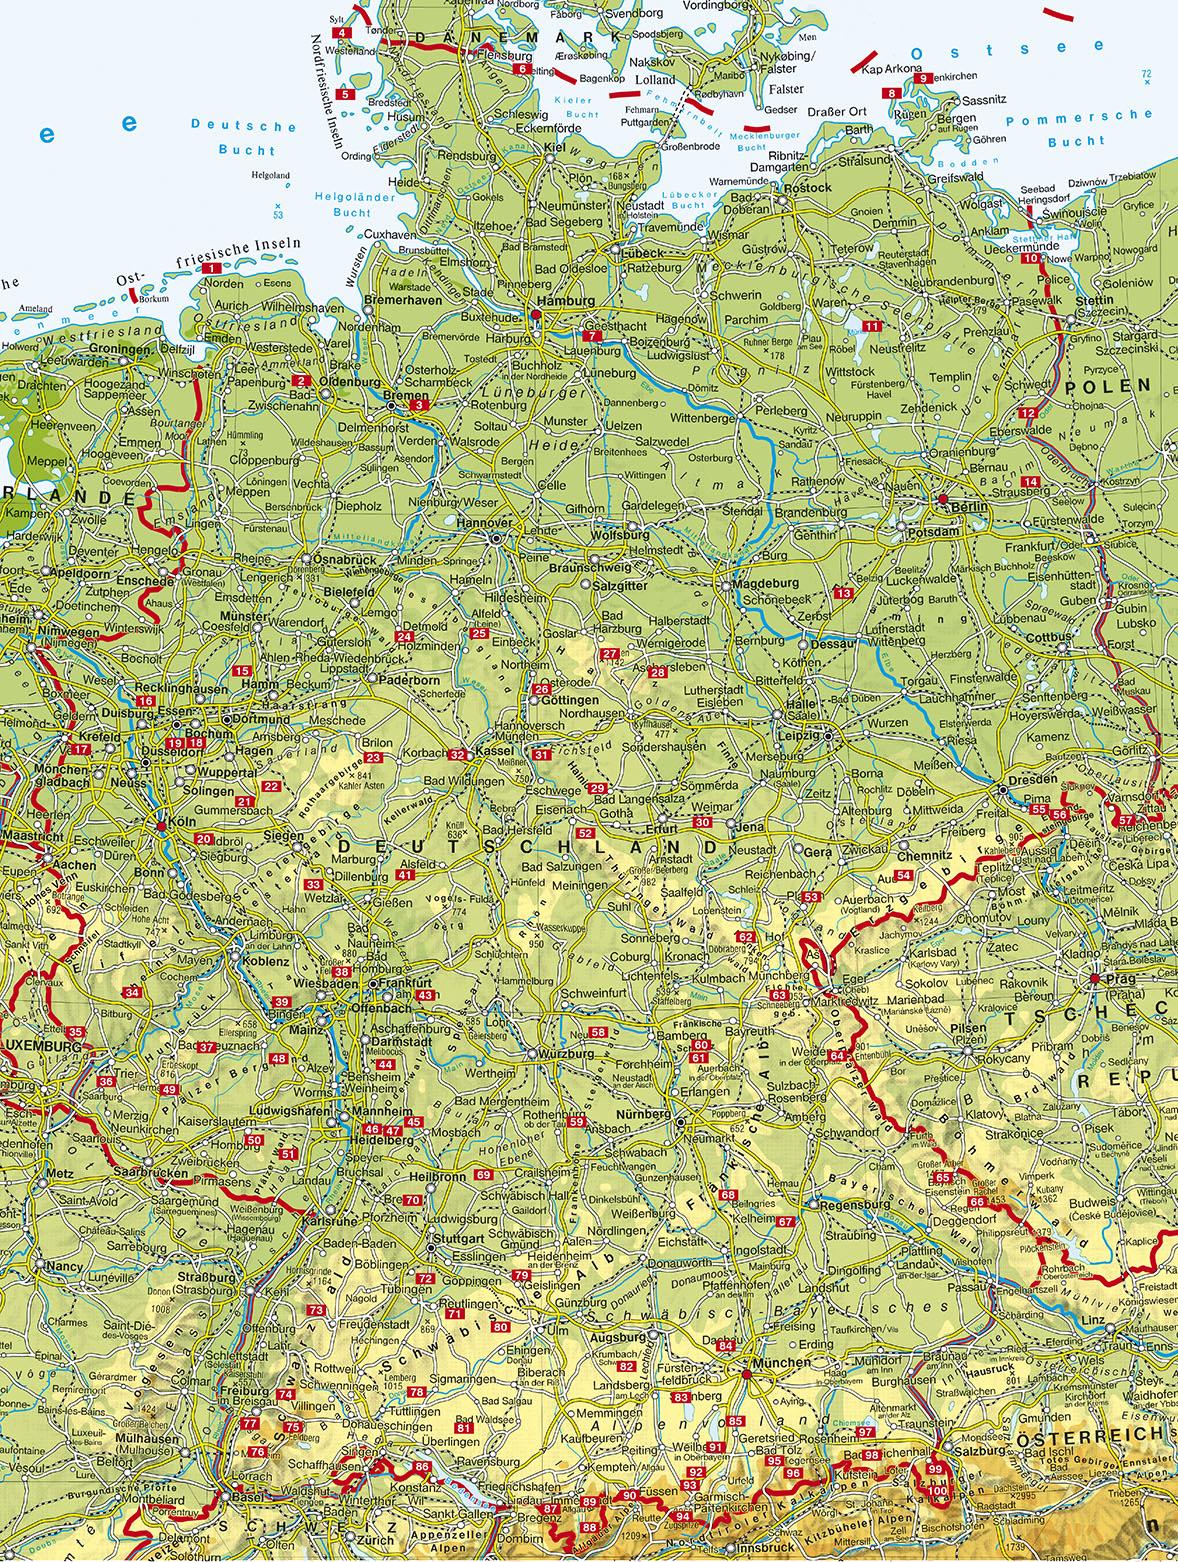 Rother wandelgids Deutschland | Rother Jubiläums-Wanderführer 9783763332069  Bergverlag Rother RWG  Wandelgidsen Duitsland